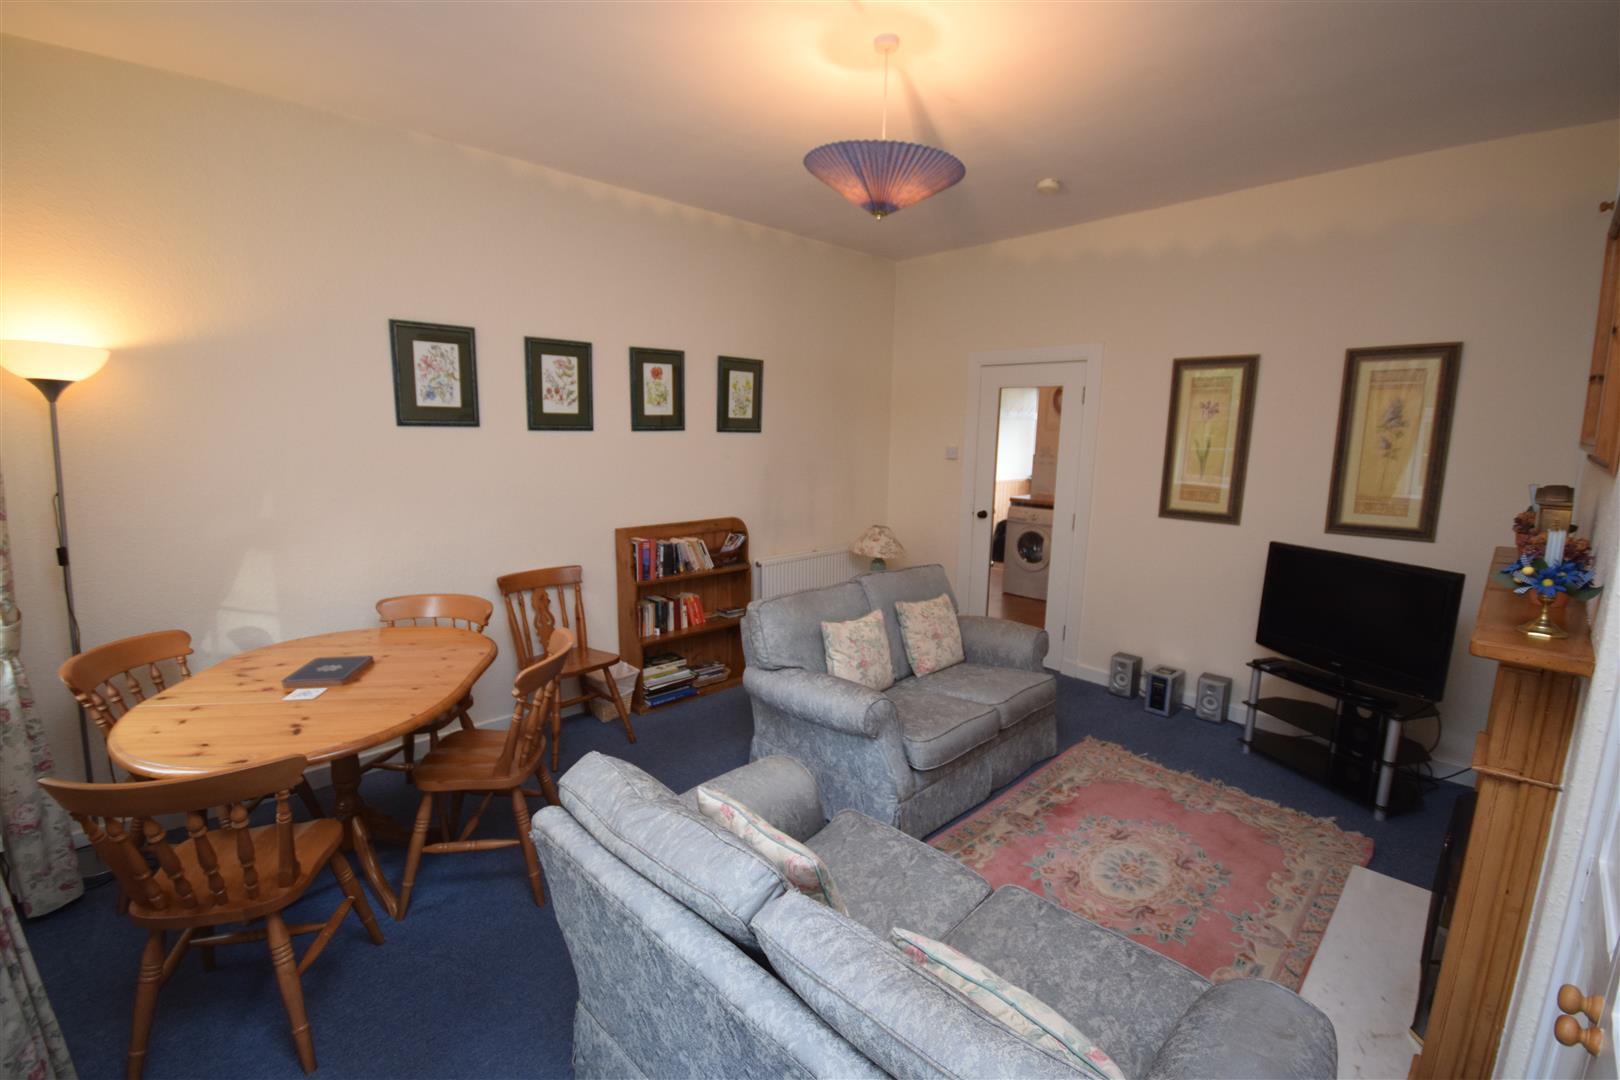 Braveheart Cottage, Drumkilbo House, Meigle, Perthshire, PH12 8QS, UK